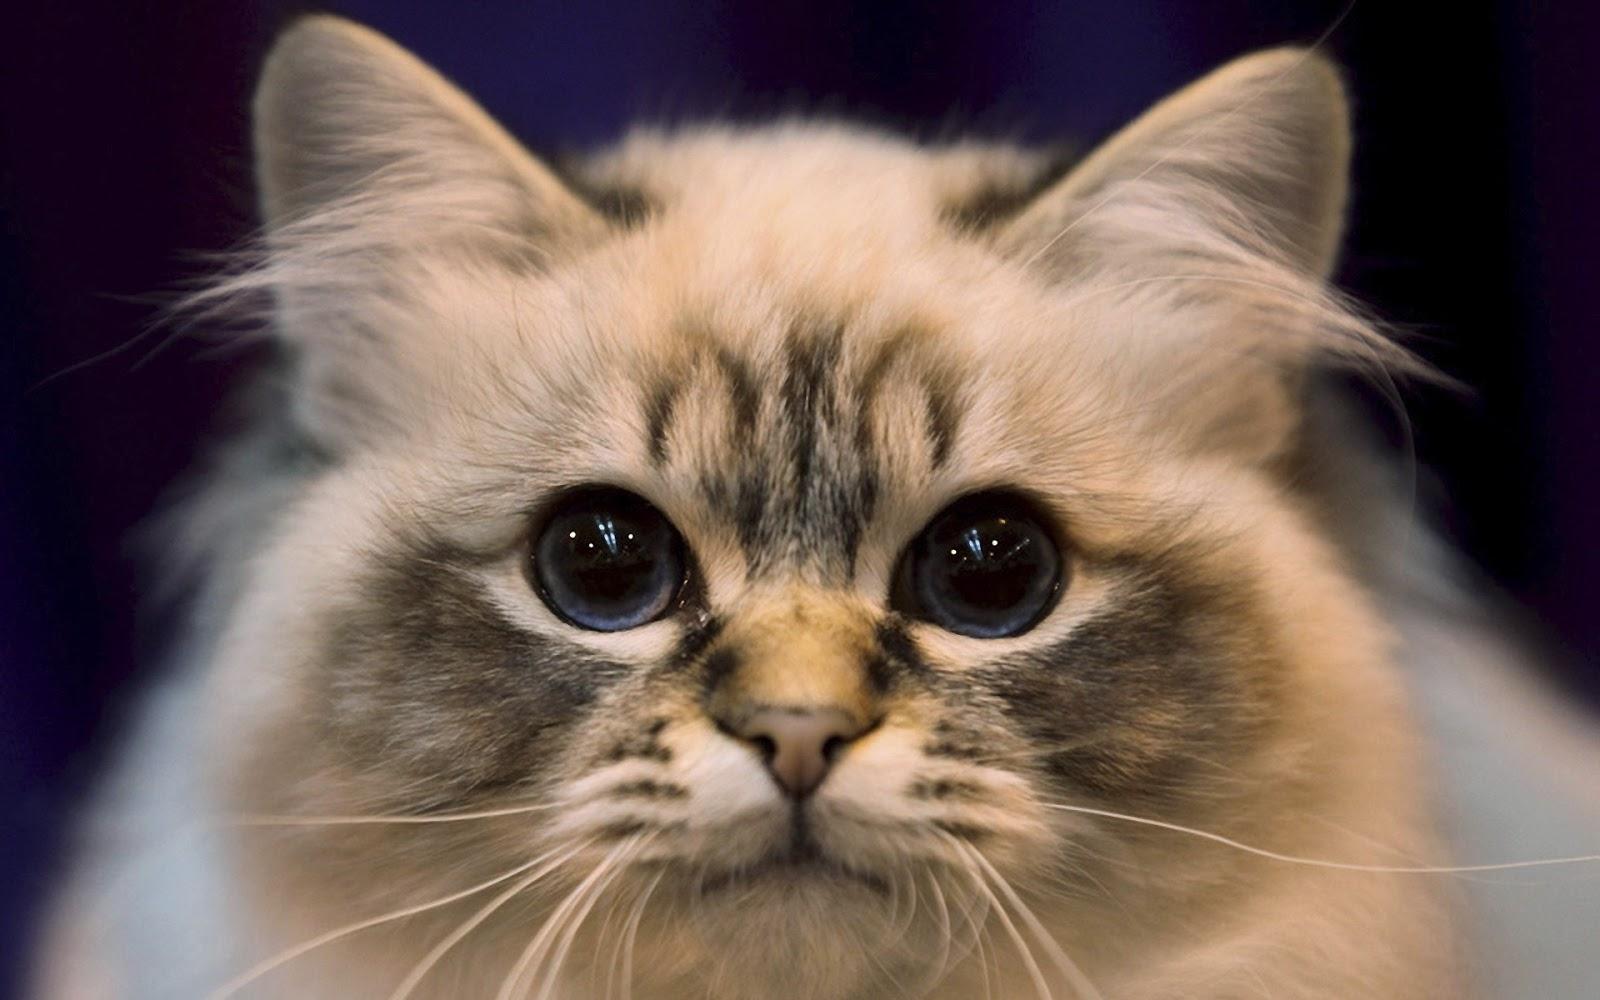 cats cat close kitty pretty kitten kittens cutest sweet adorable face very cutie wallpapers kat